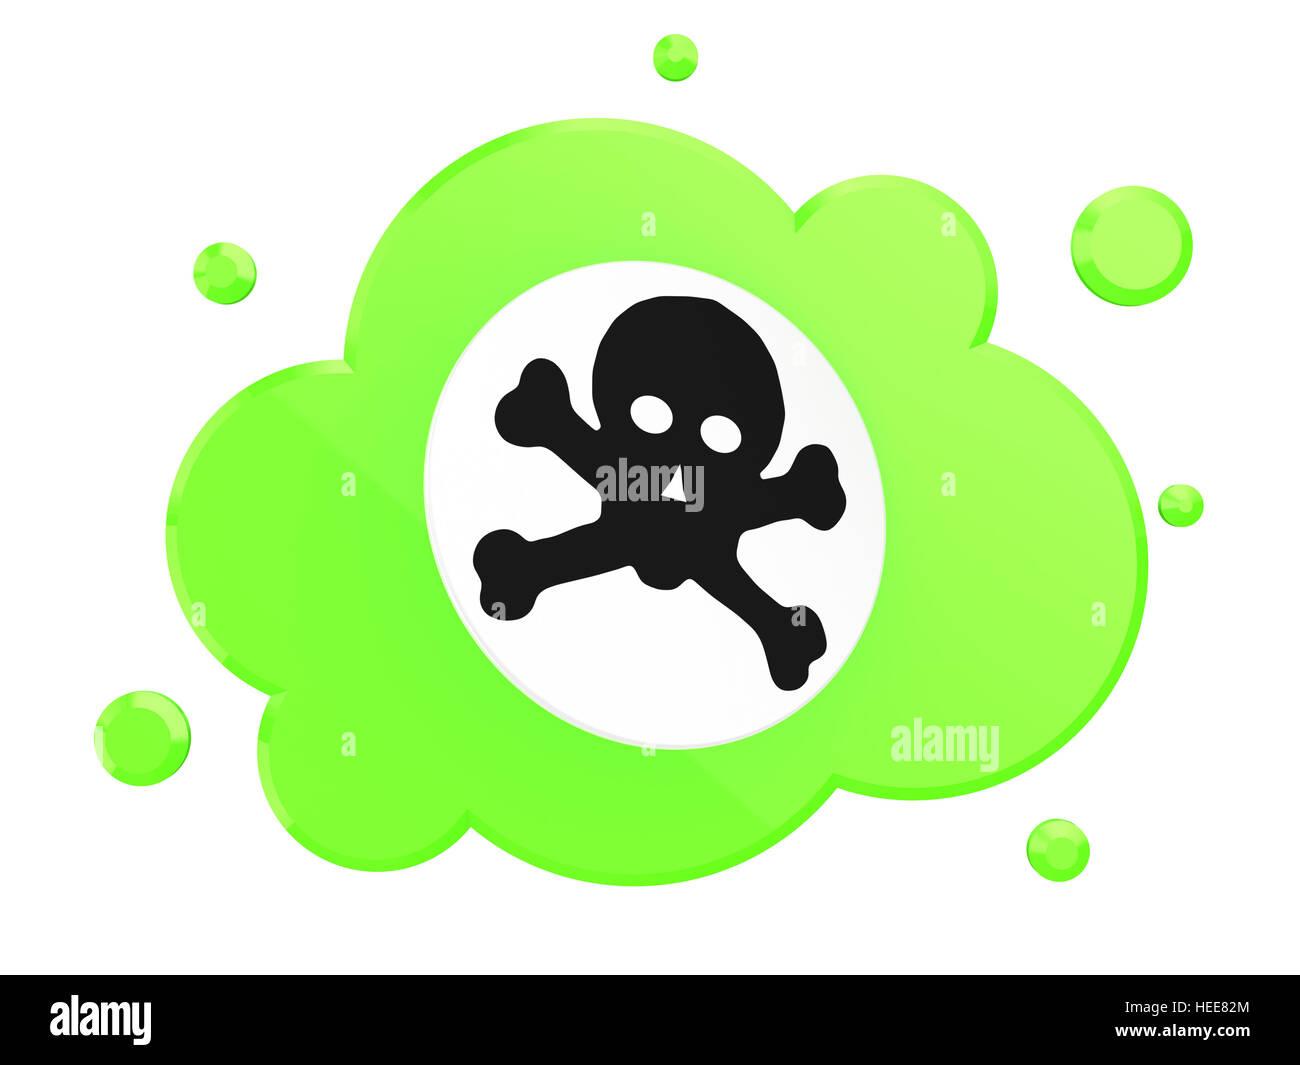 3d Illustration Of Poison Cloud Symbol Over White Background Stock